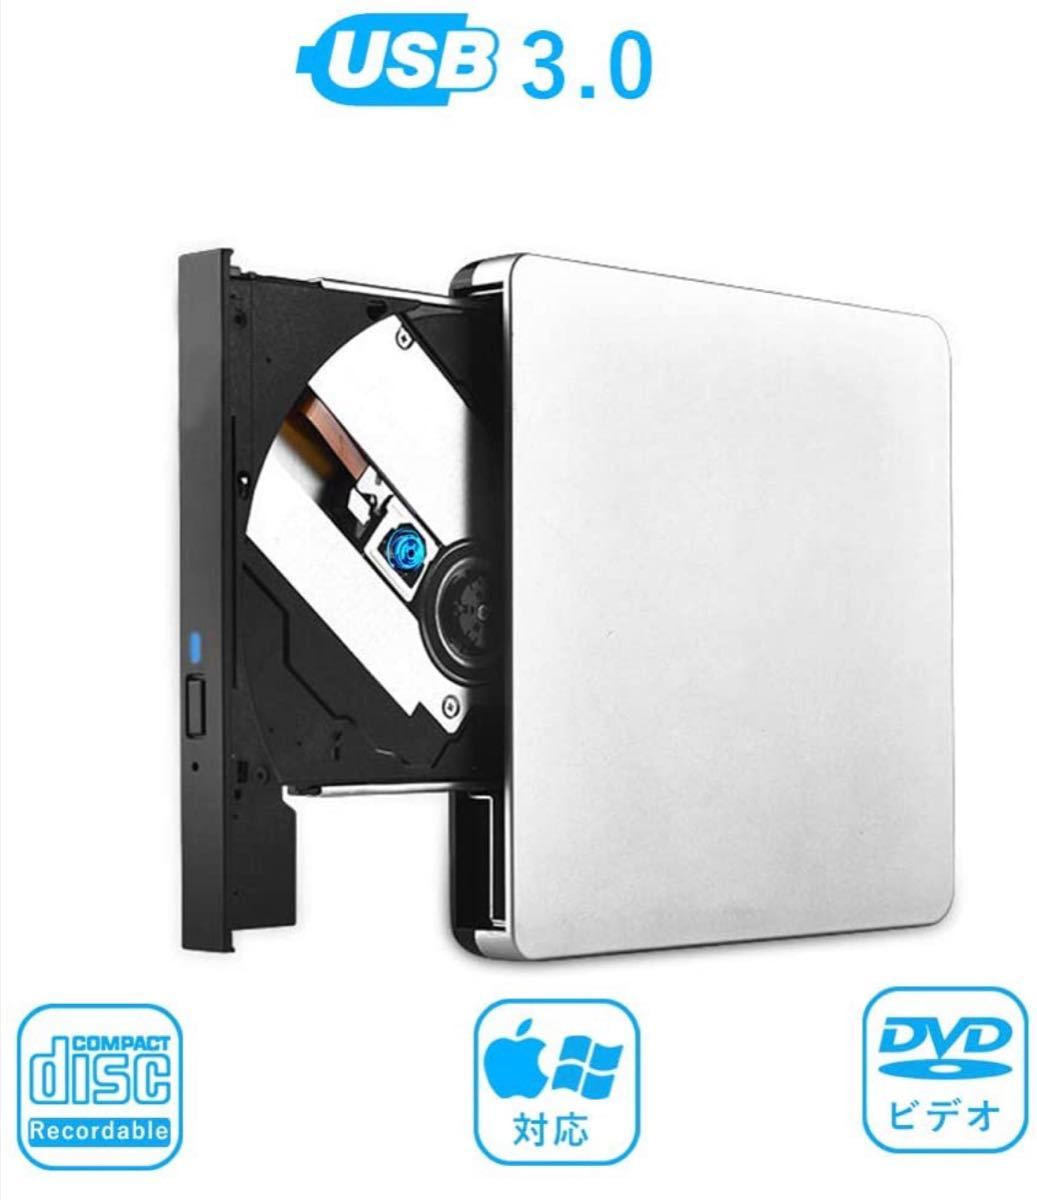 DVD・CD 再生ドライブ 再生USB 3.0ポータブル カラー: シルバー